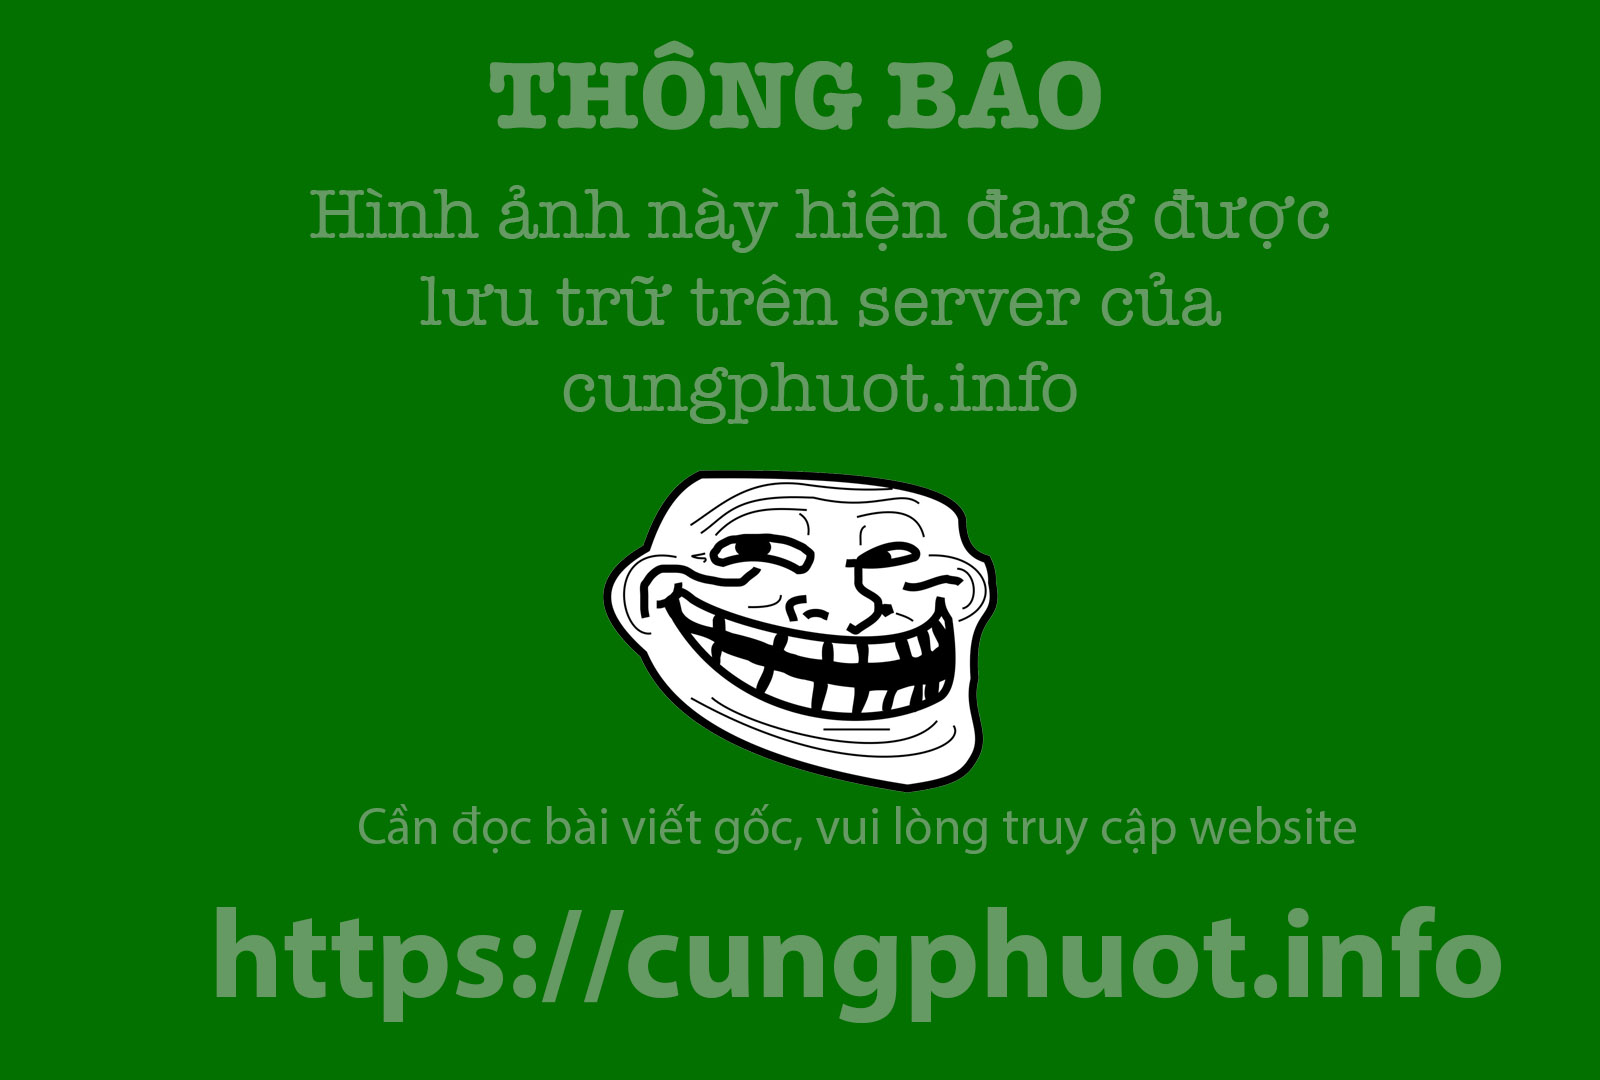 Binh minh tuyet dep tren nhung doi che Tan Cuong hinh anh 9